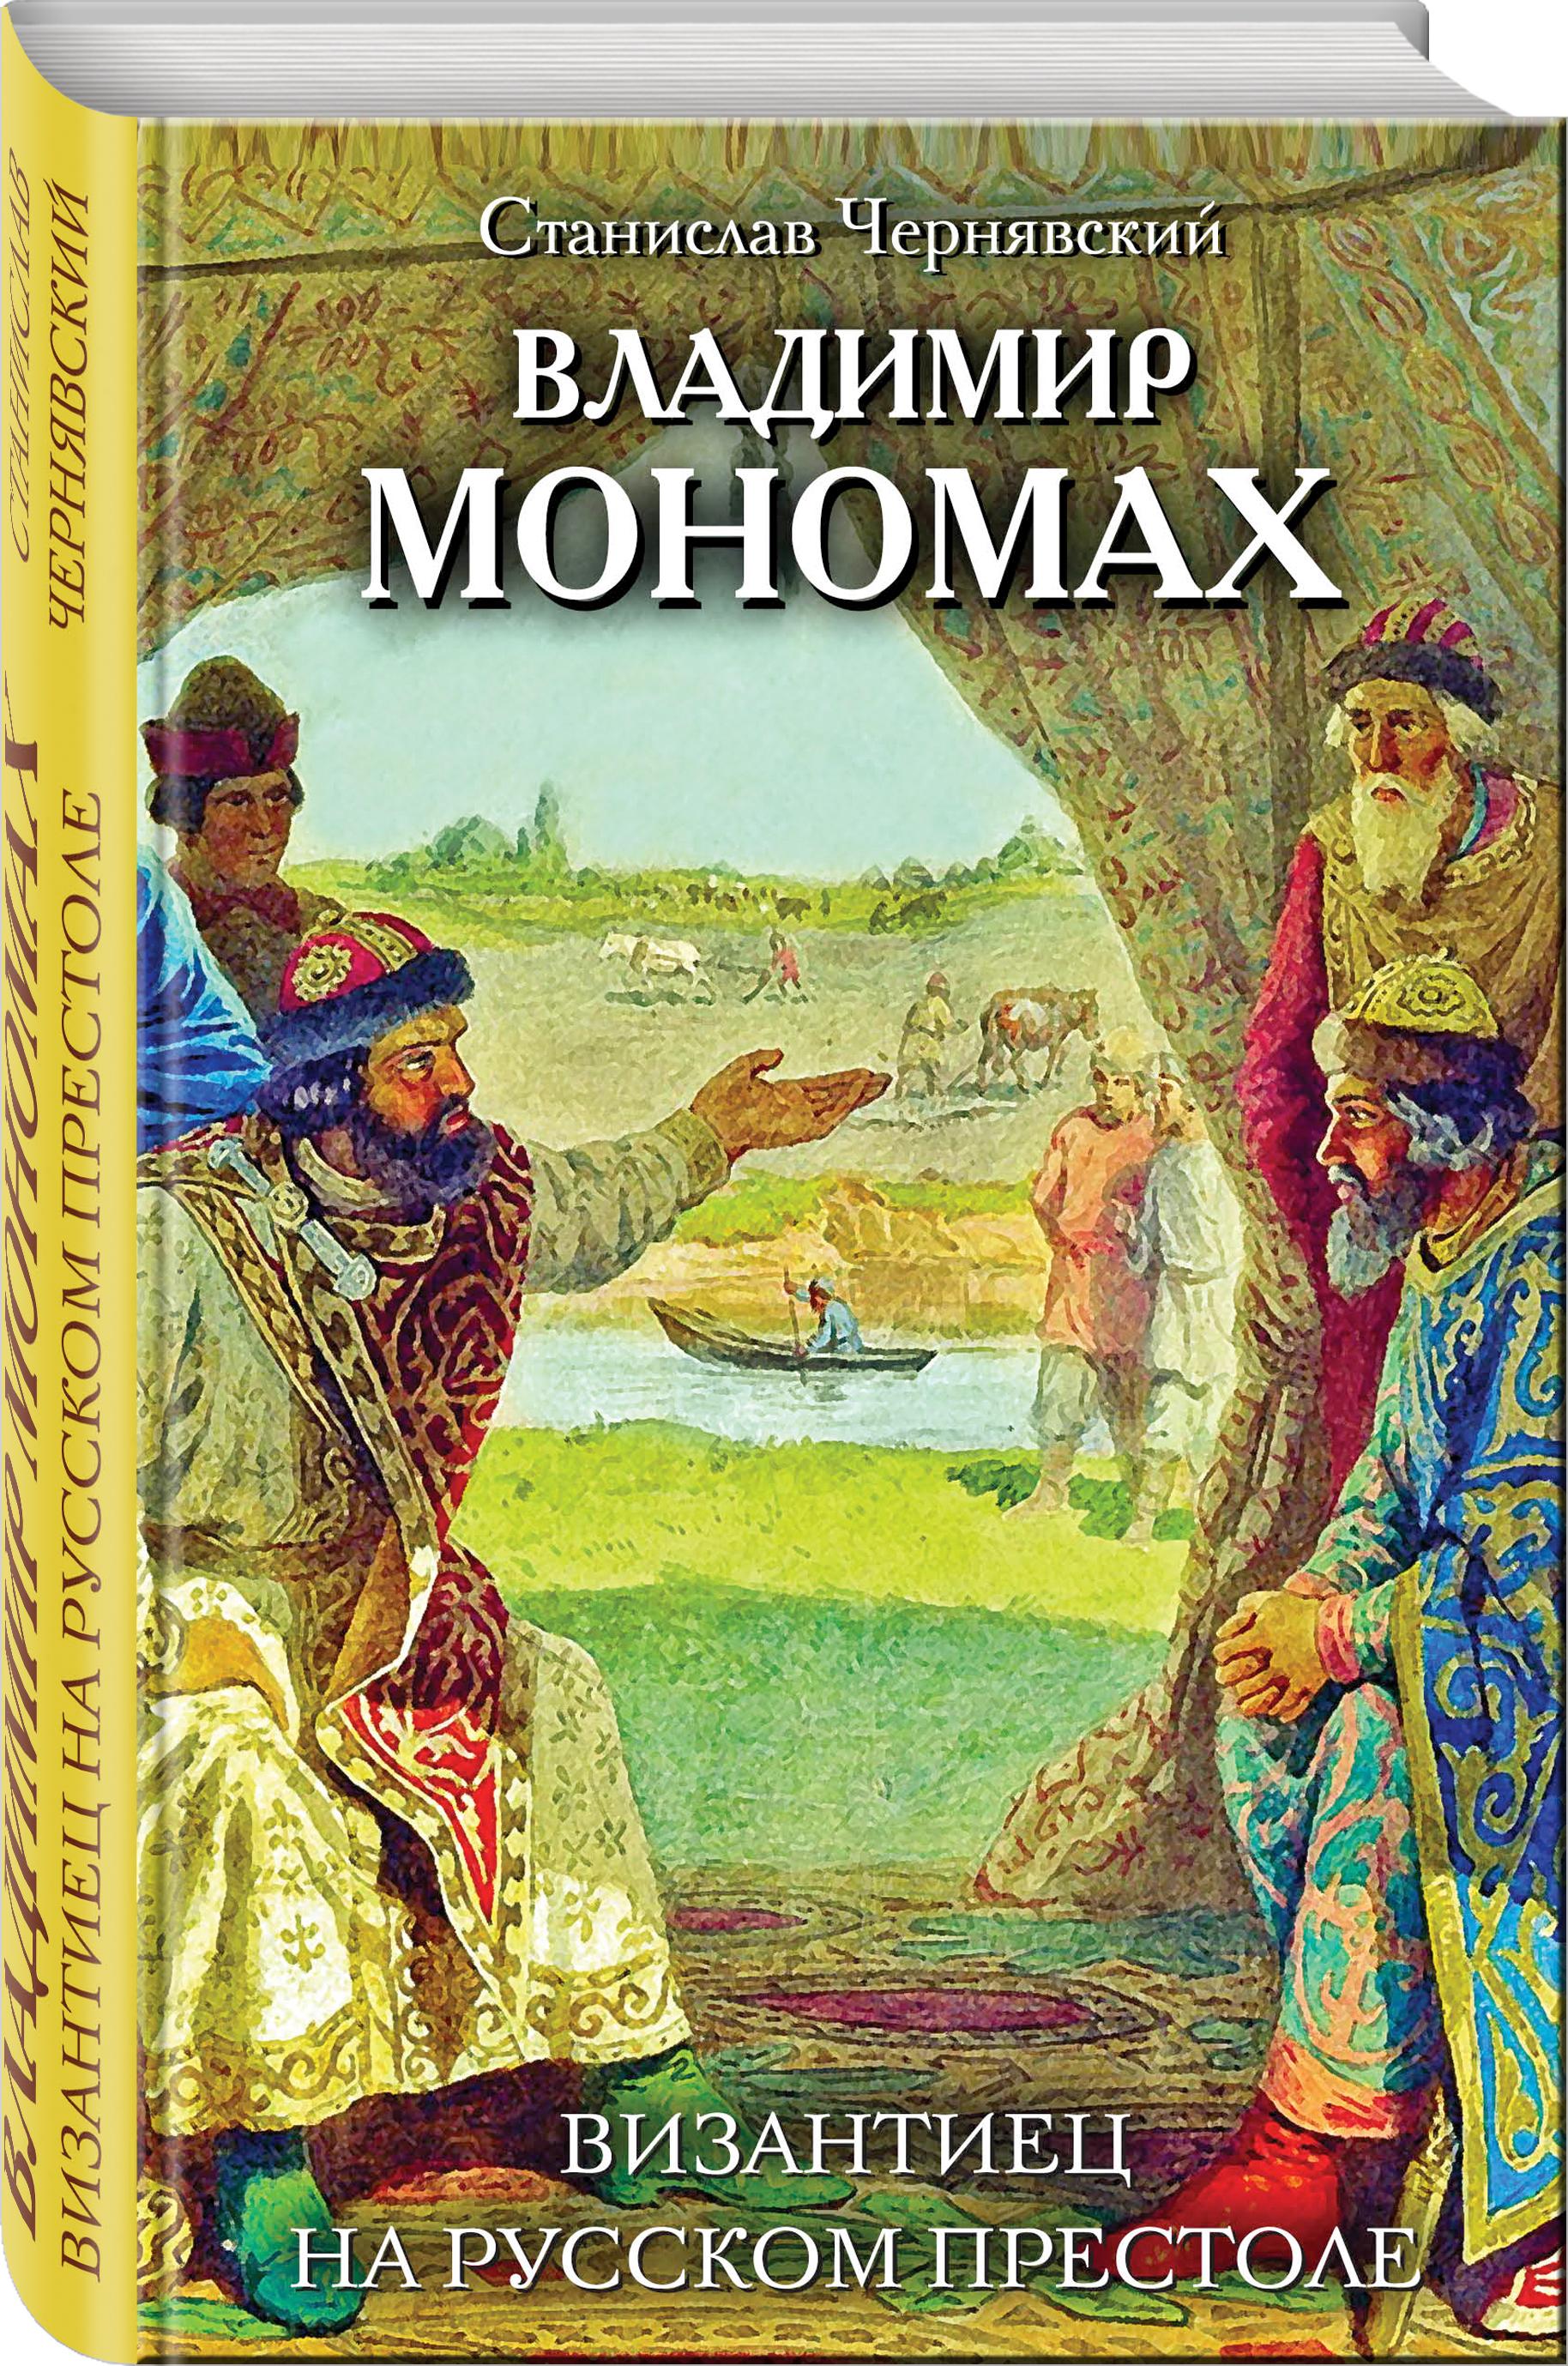 Владимир Мономах. Византиец на русском престоле